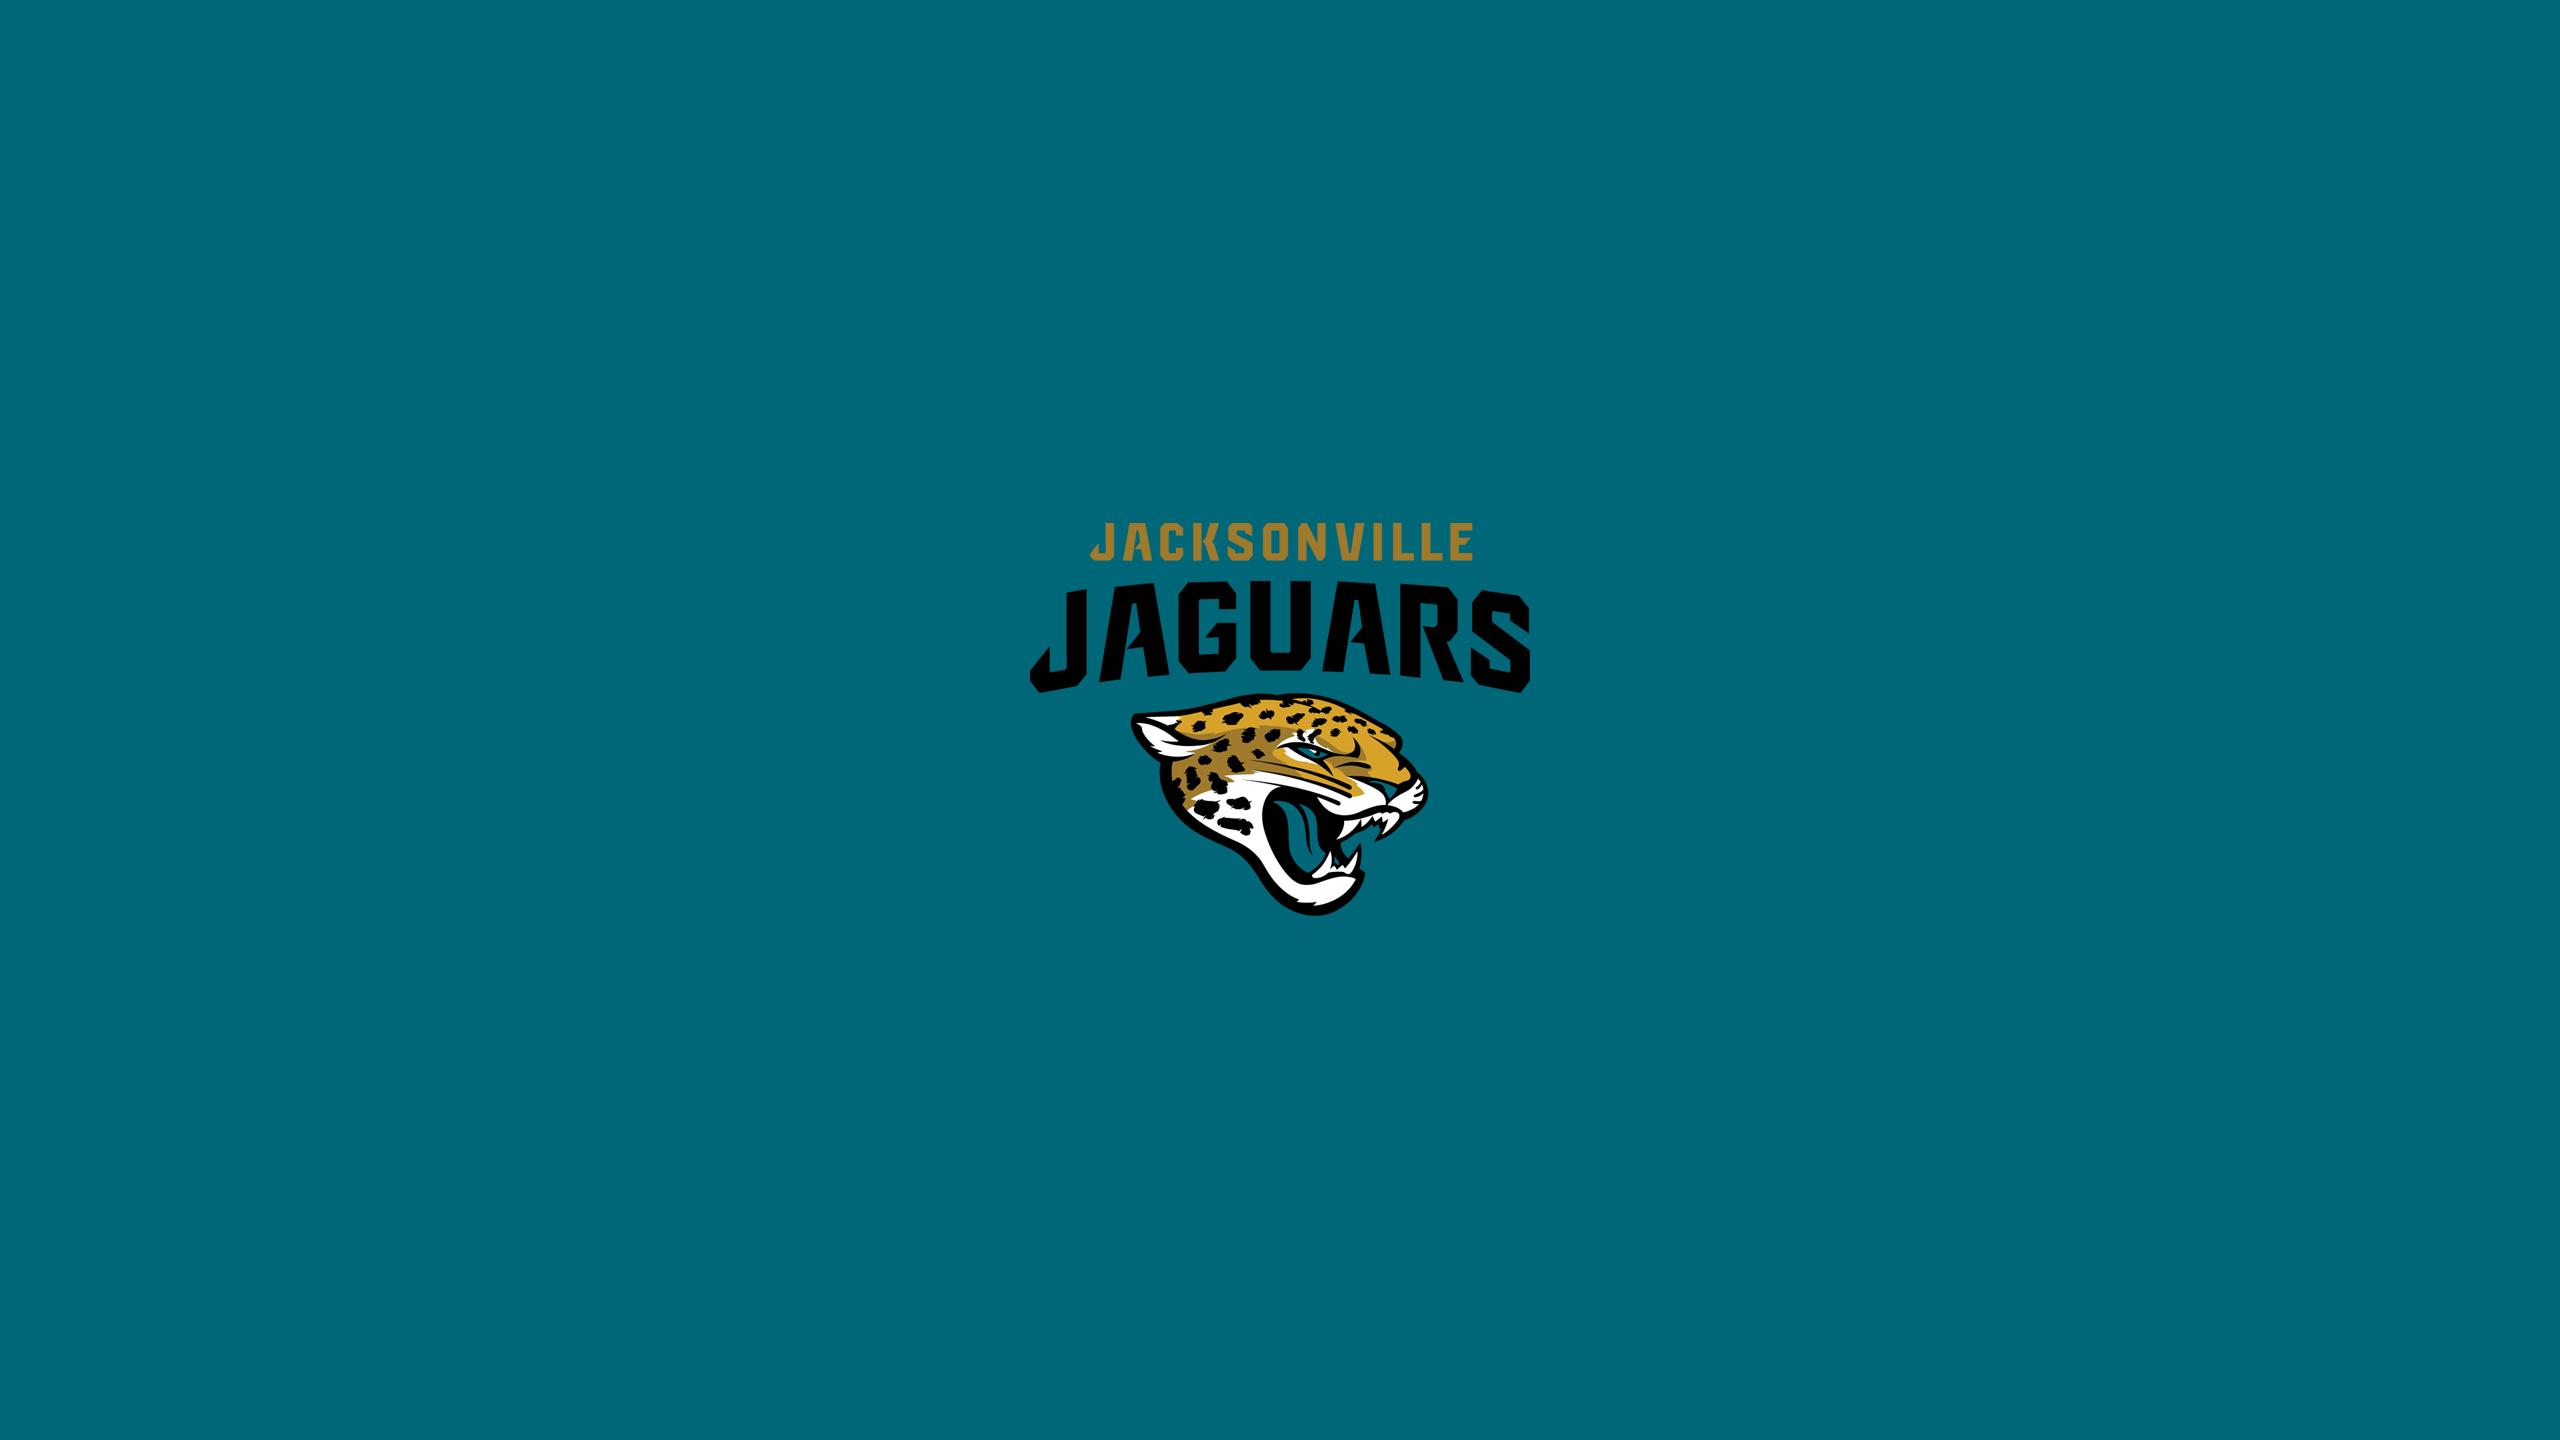 Jacksonville Jaguars Wallpaper 14507 25601440 px fond ecran 2560x1440